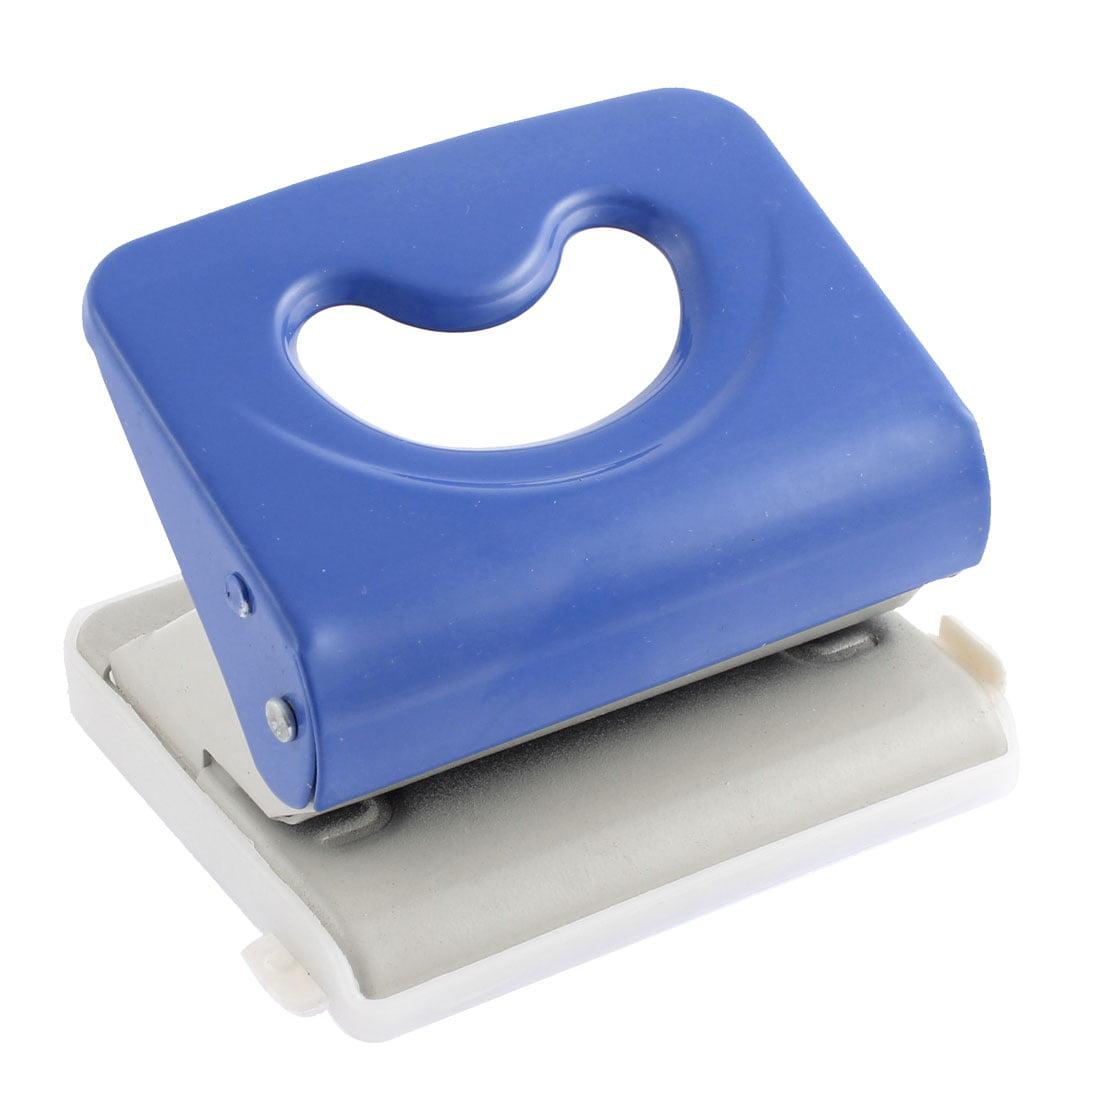 Unique Bargains Press Type 80mm Hole Distance Double 6mm Holes Paper Punching Tool Blue